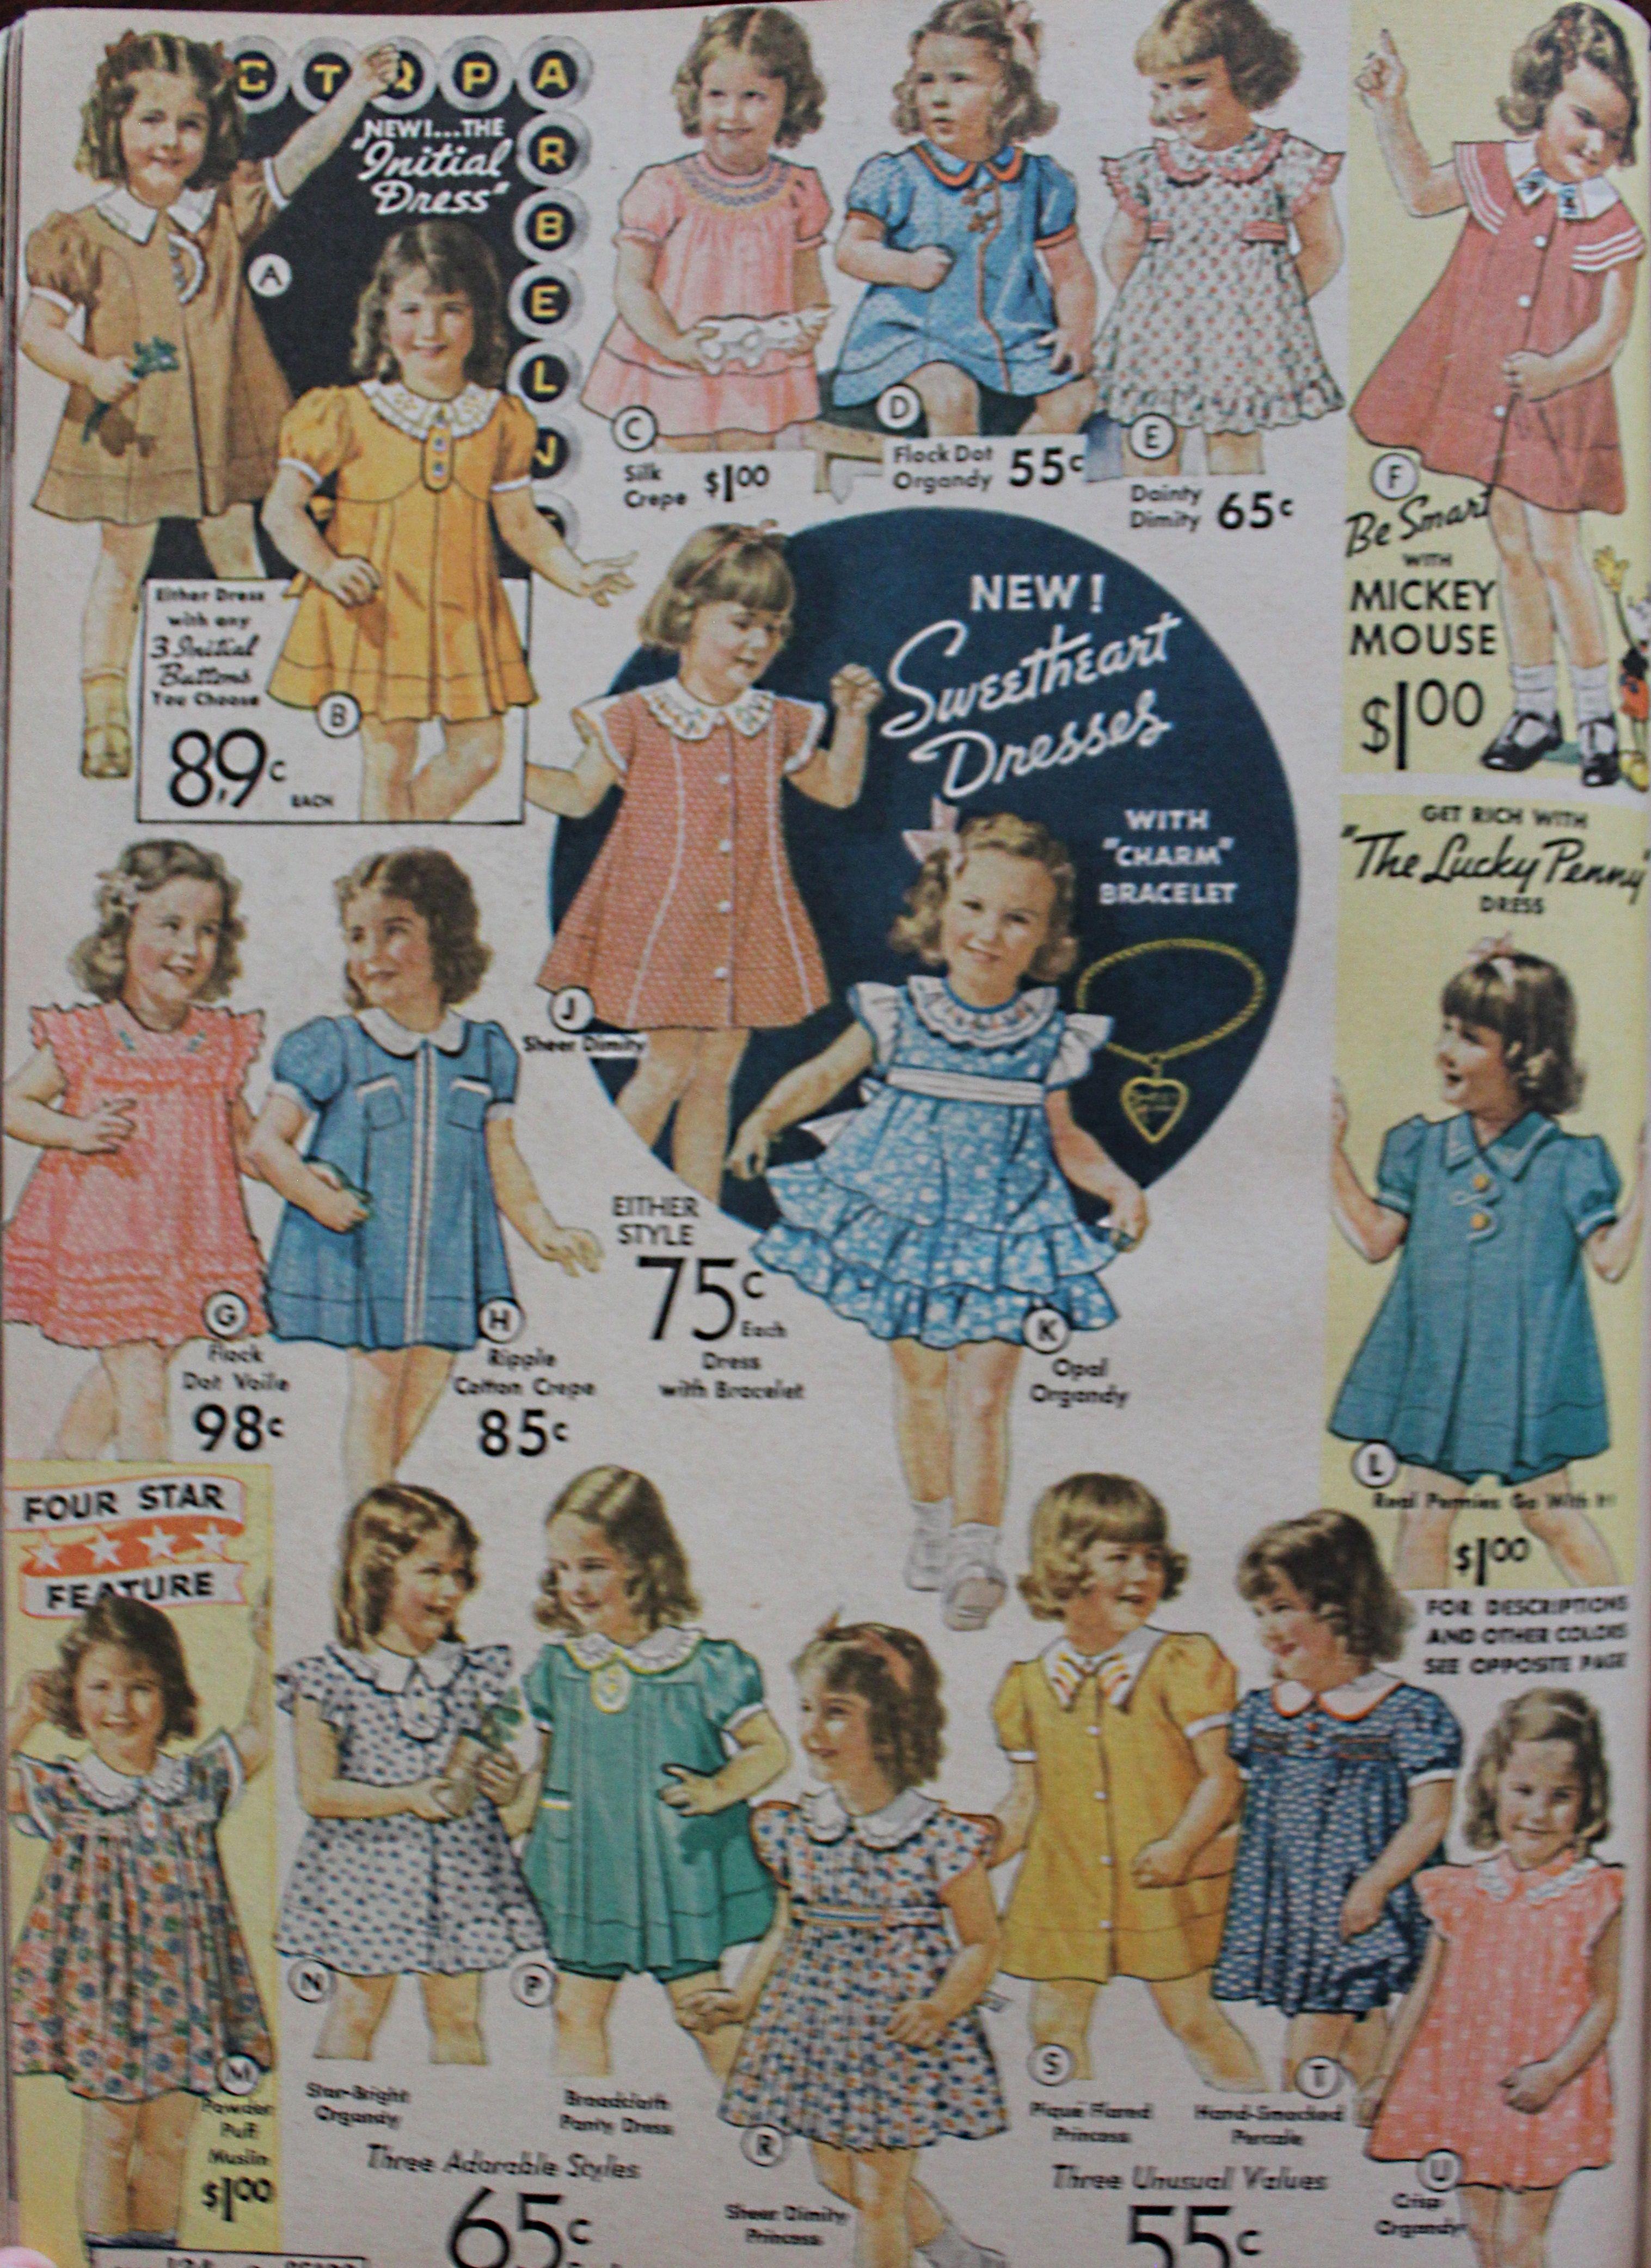 Vintage Style Children's Clothing: Girls, Boys, Baby ...